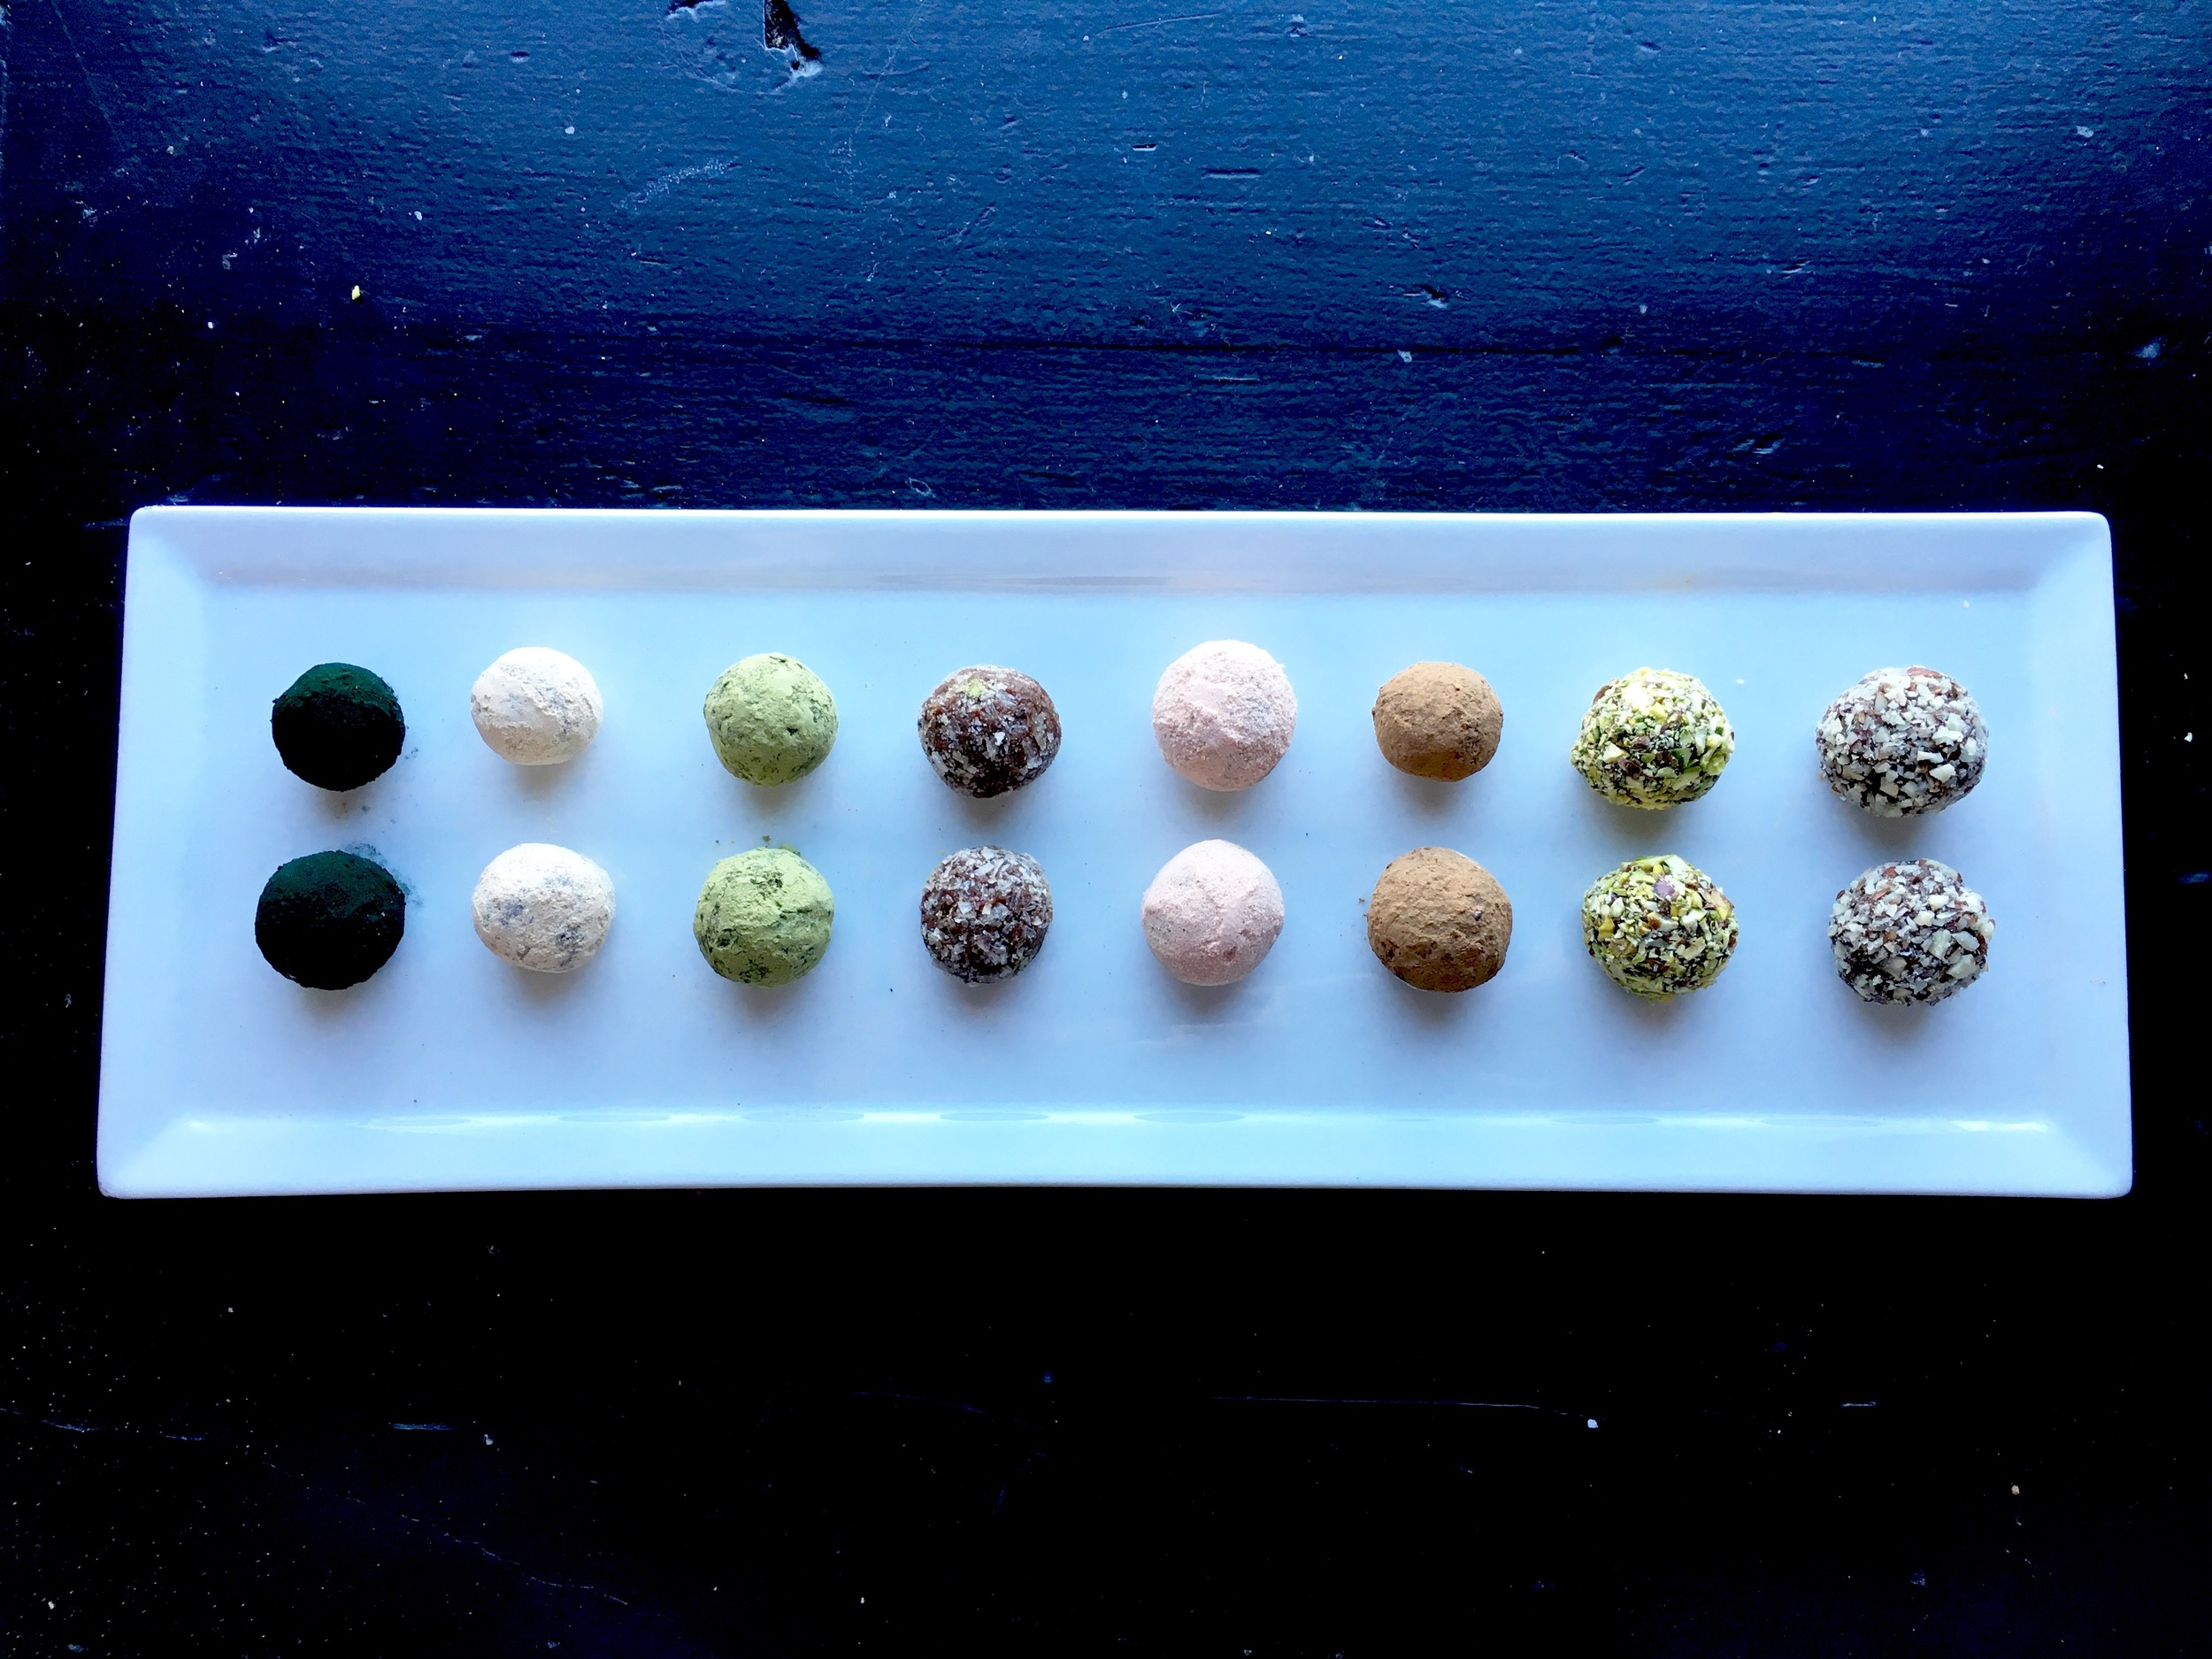 Truffles! (from left to right) // Spirulina /Lucuma / Matcha / Smoked salt / Pomegranate powder / Cacao / Pistachio / Smoked salt +hazelnut